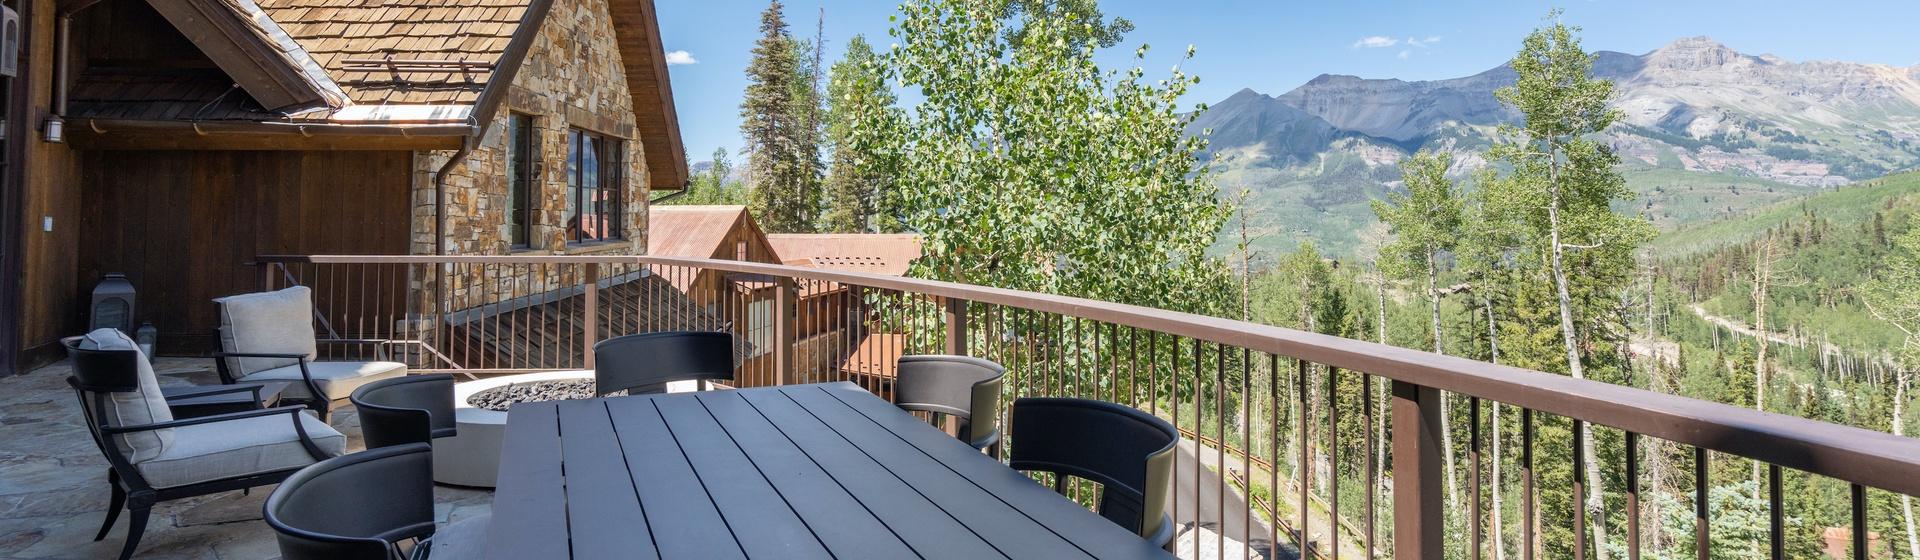 11-Mountain-Village-Birch-Cassidy-Outdoor-Deck-table